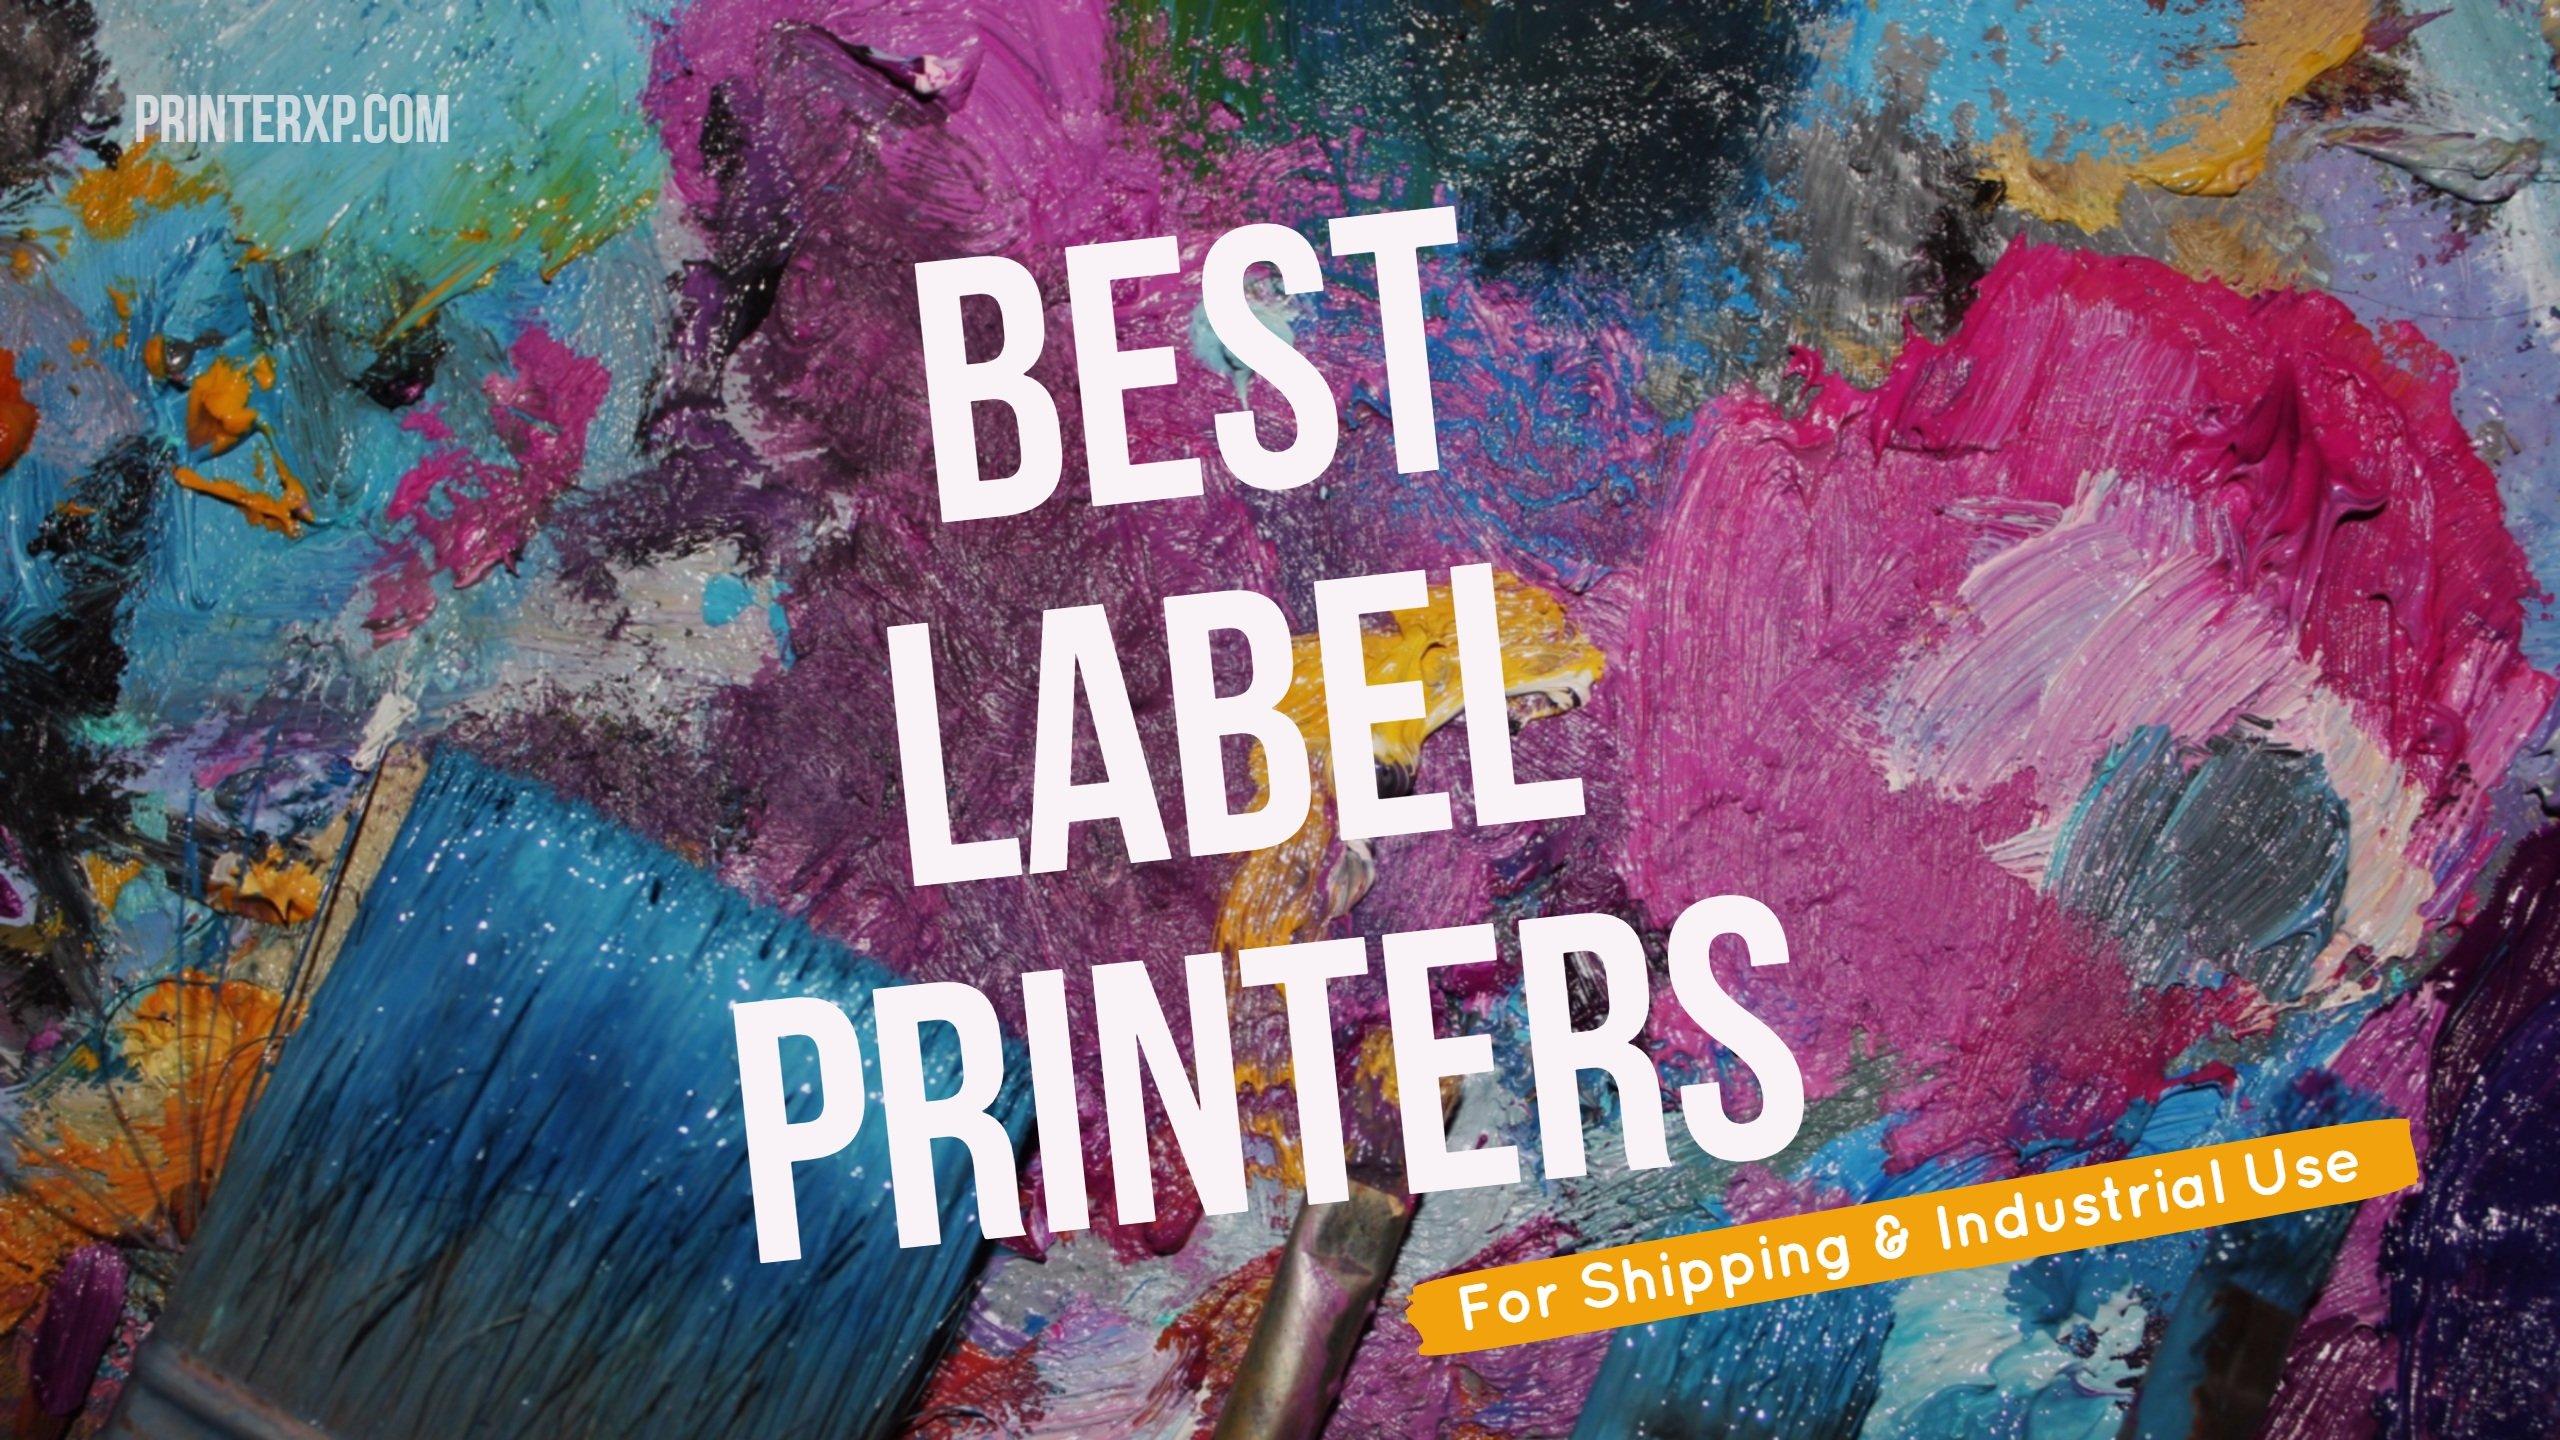 Best Label Printers